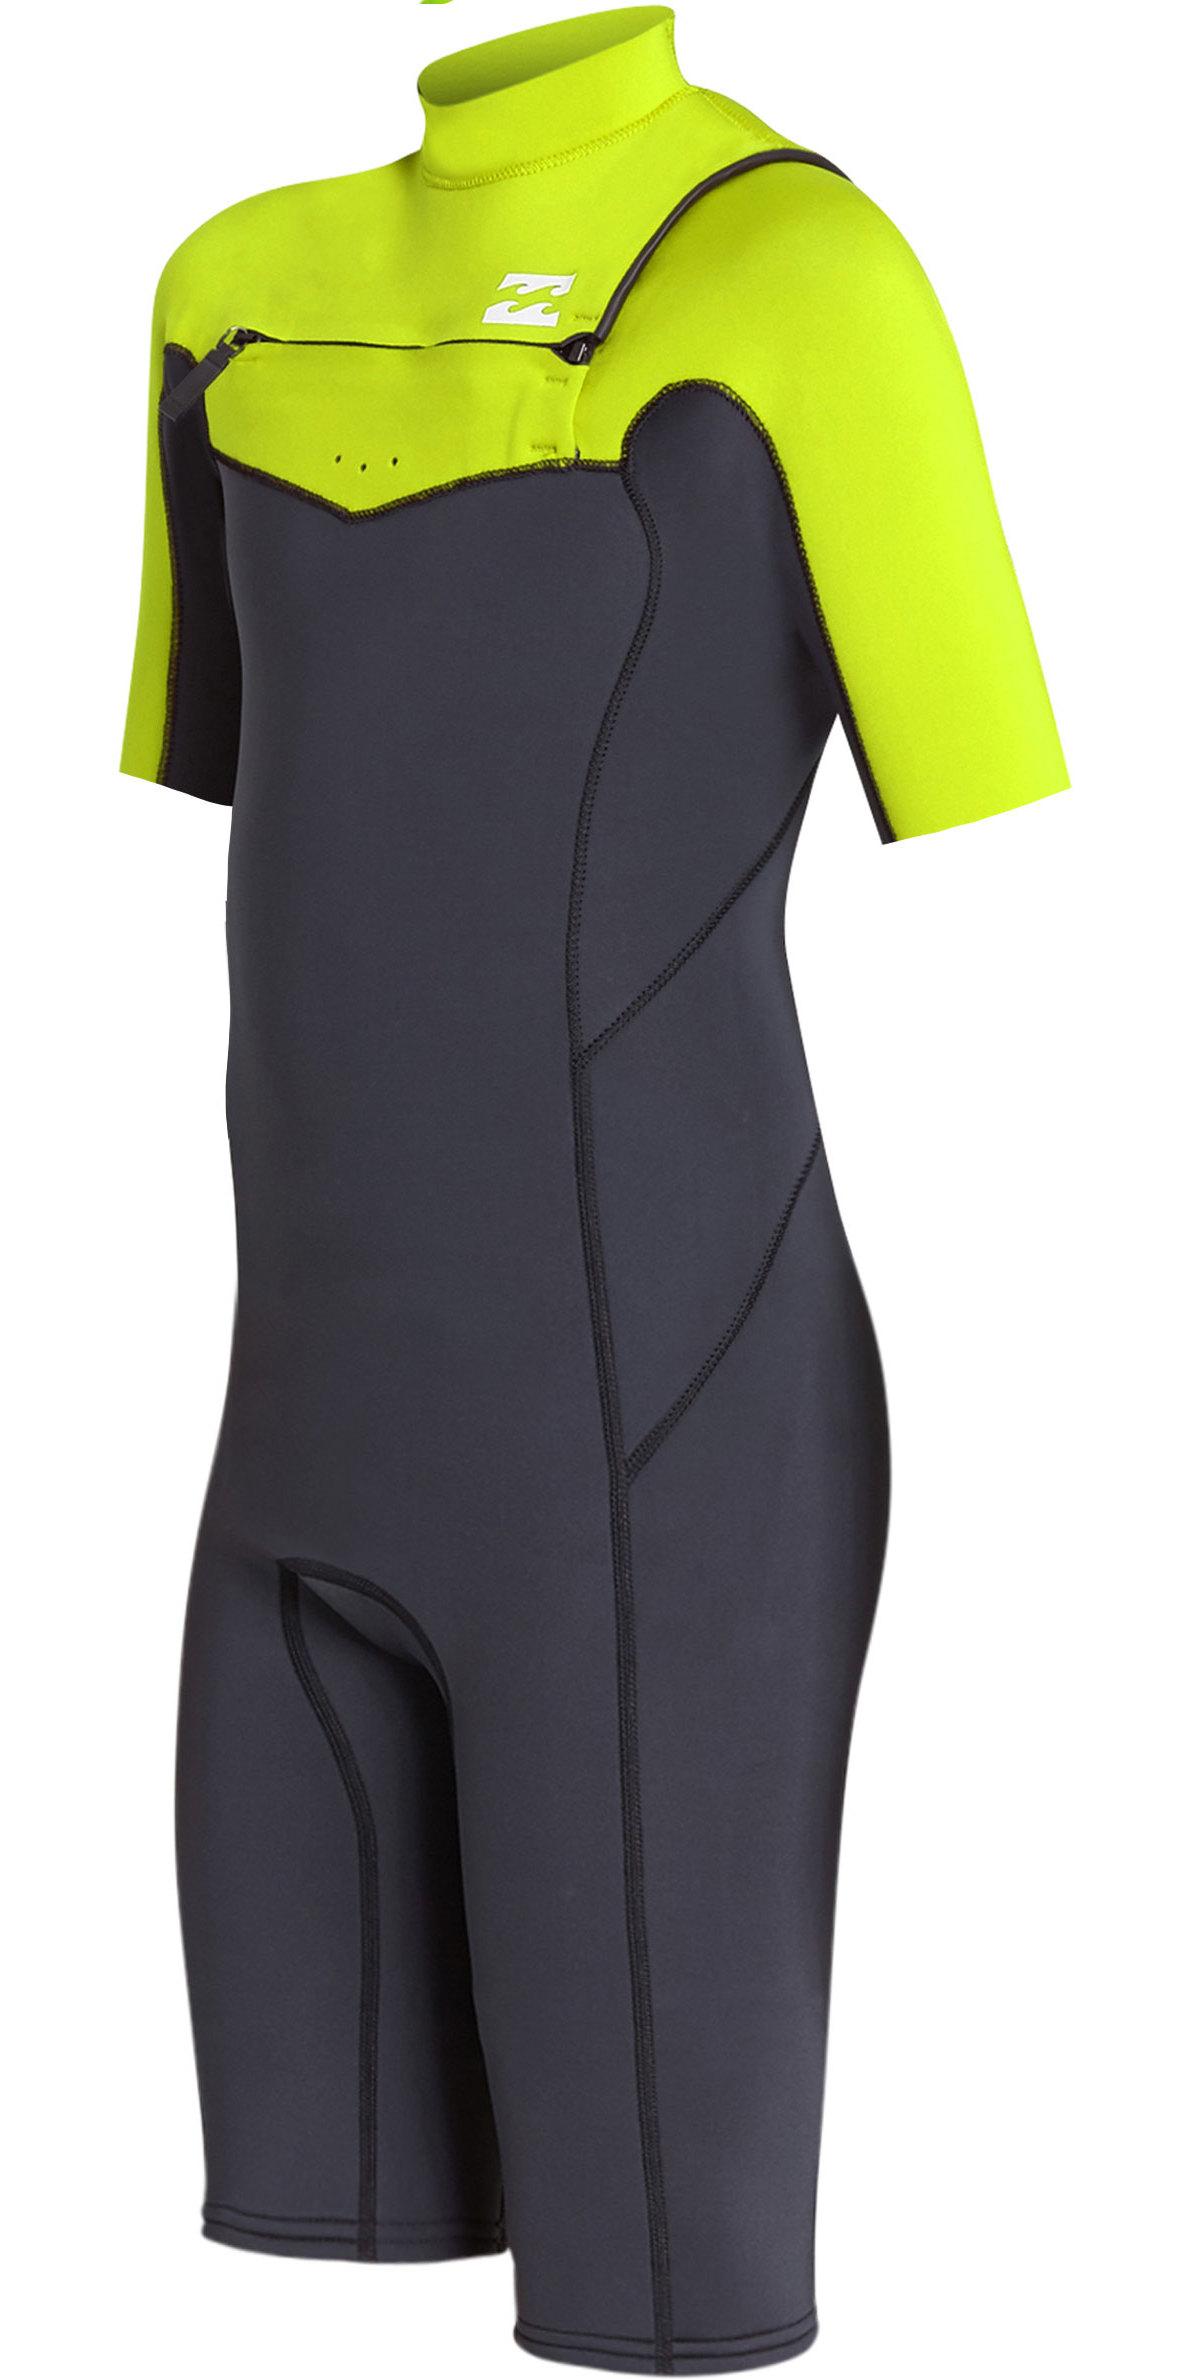 2019 Billabong Junior Boys Furnace Absolute 2mm Chest Zip Shorty Wetsuit Neon Yellow N42B05